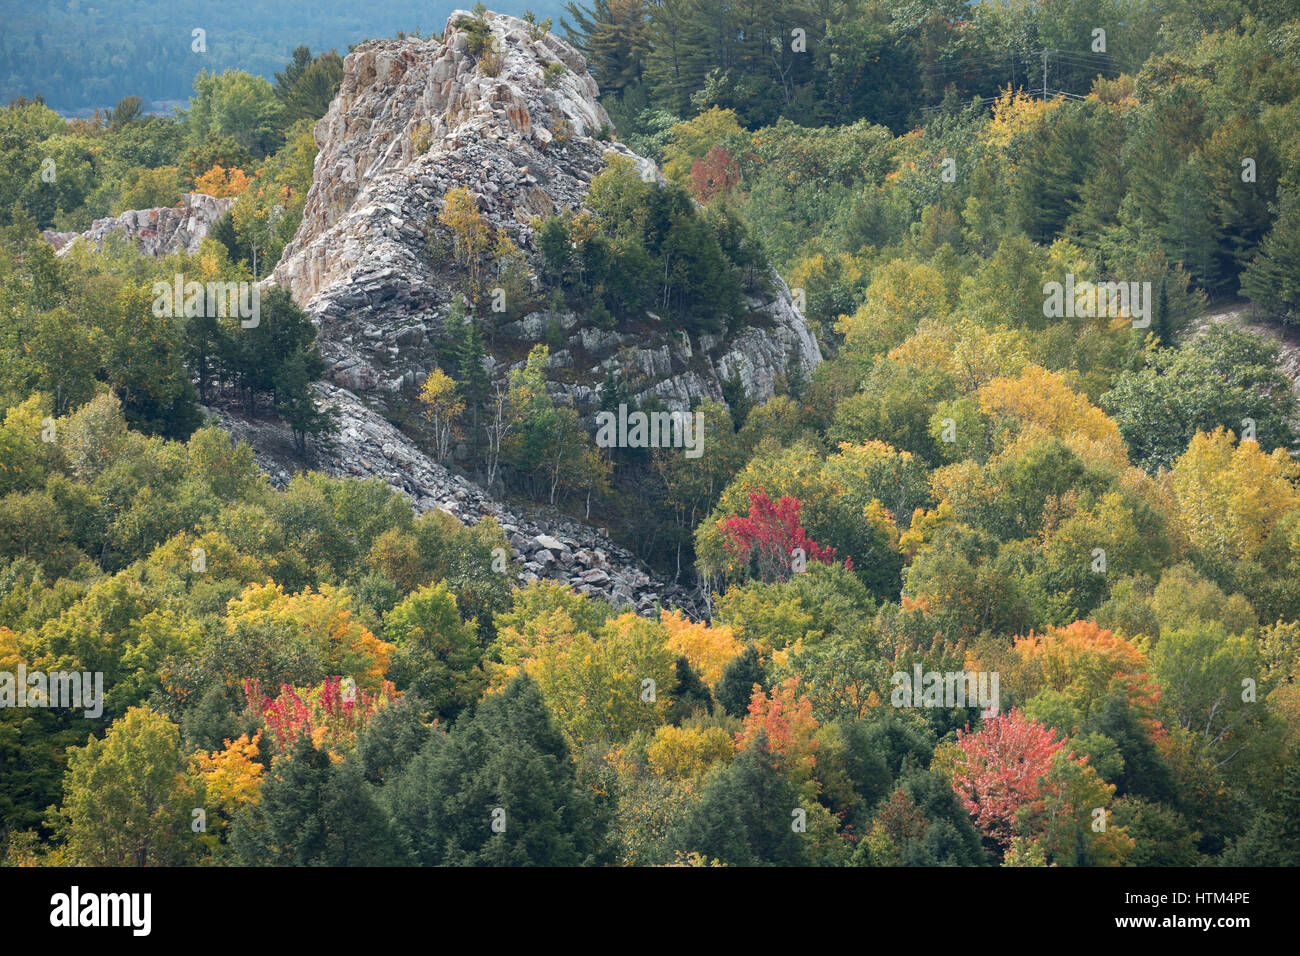 Couleurs d'Automne, lac Charlton frangeant nr Whitefish Falls, District de Sudbury, Ontario, Canada Banque D'Images